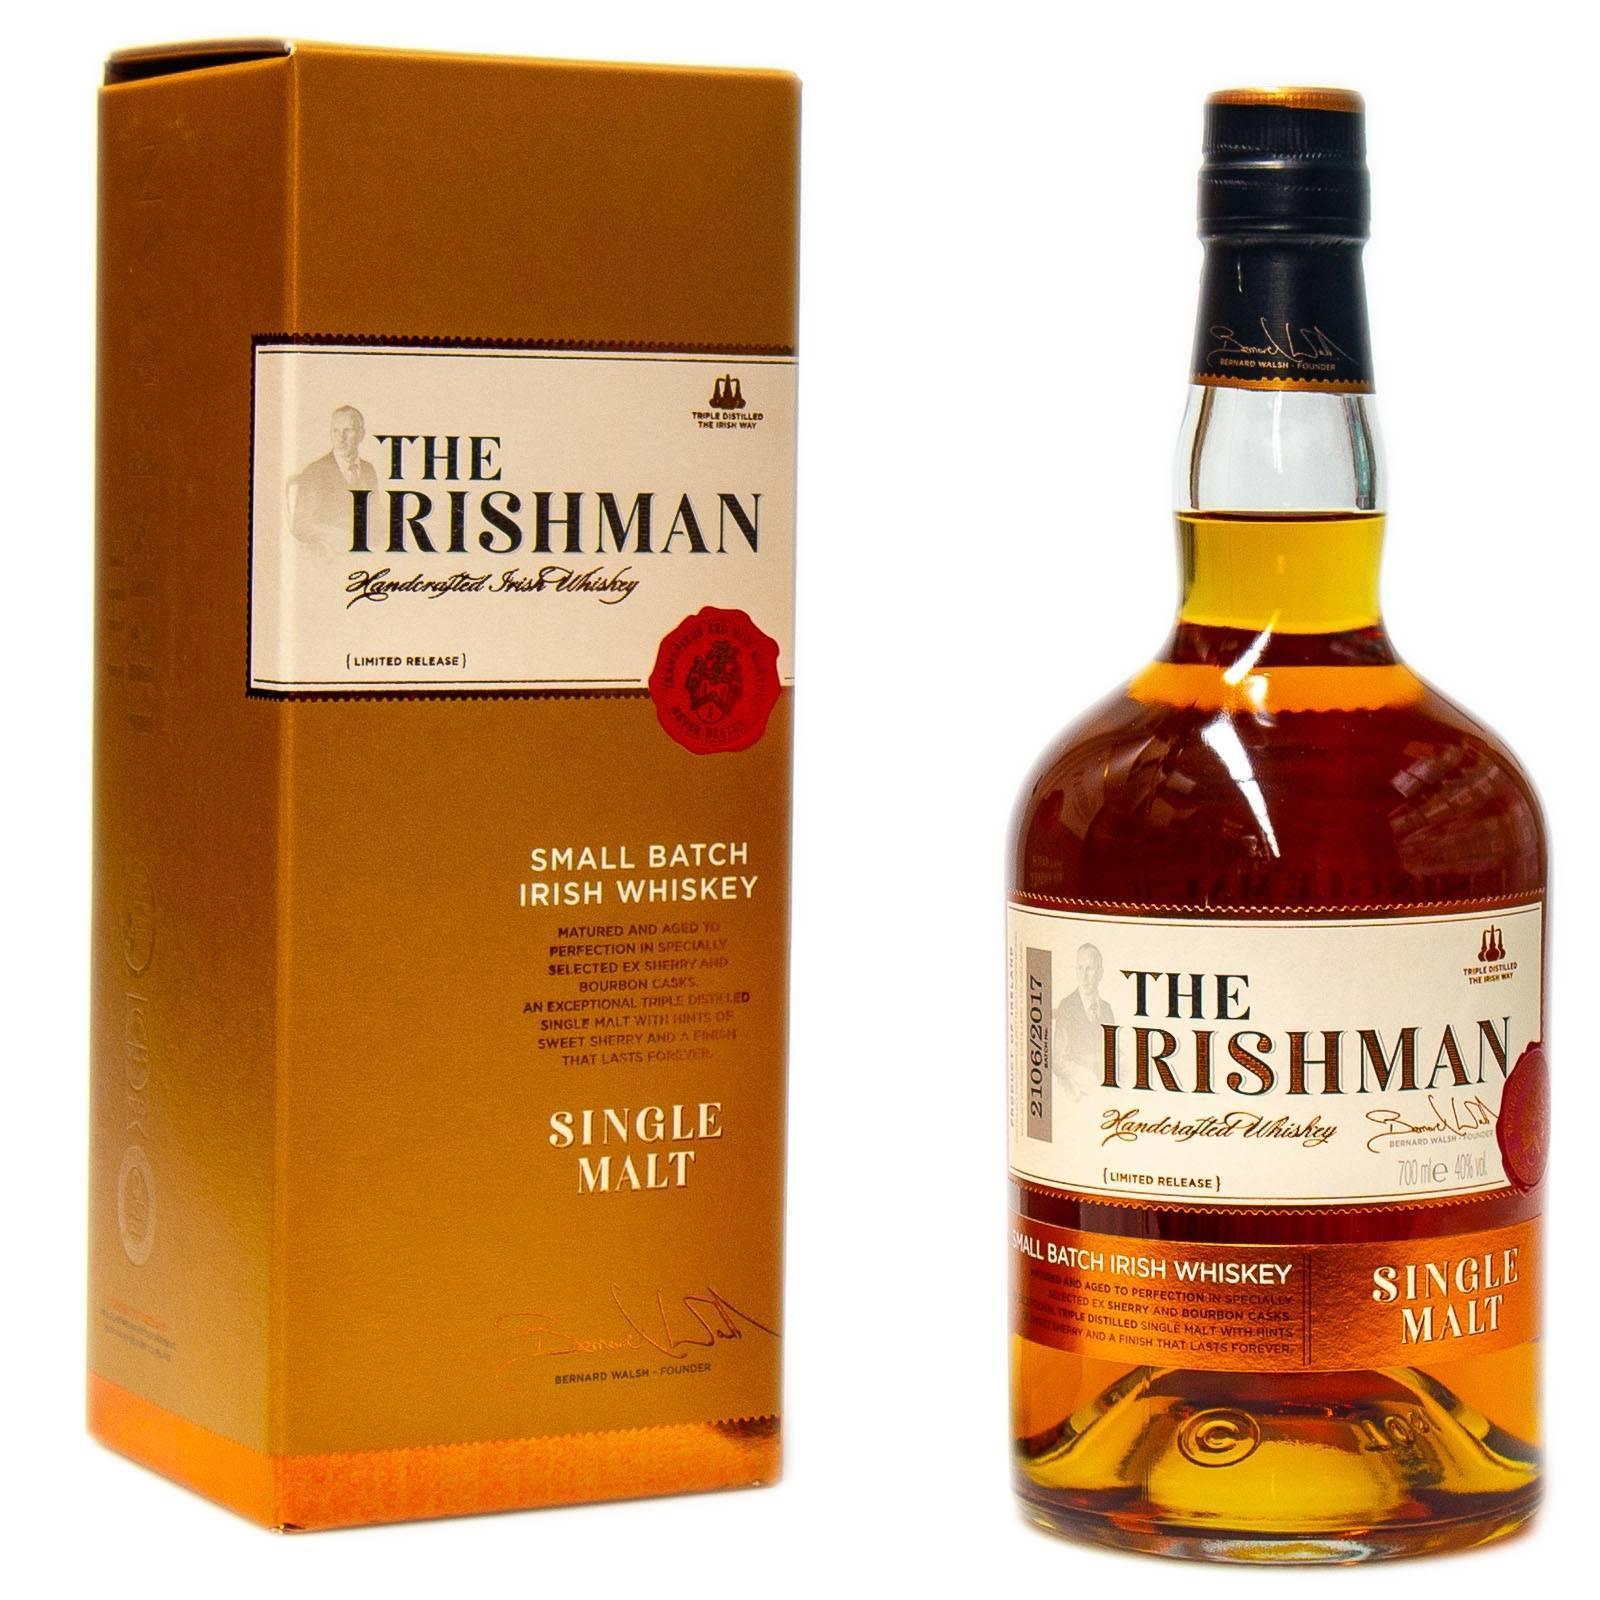 Виски irishman (айришмен) и его особенности